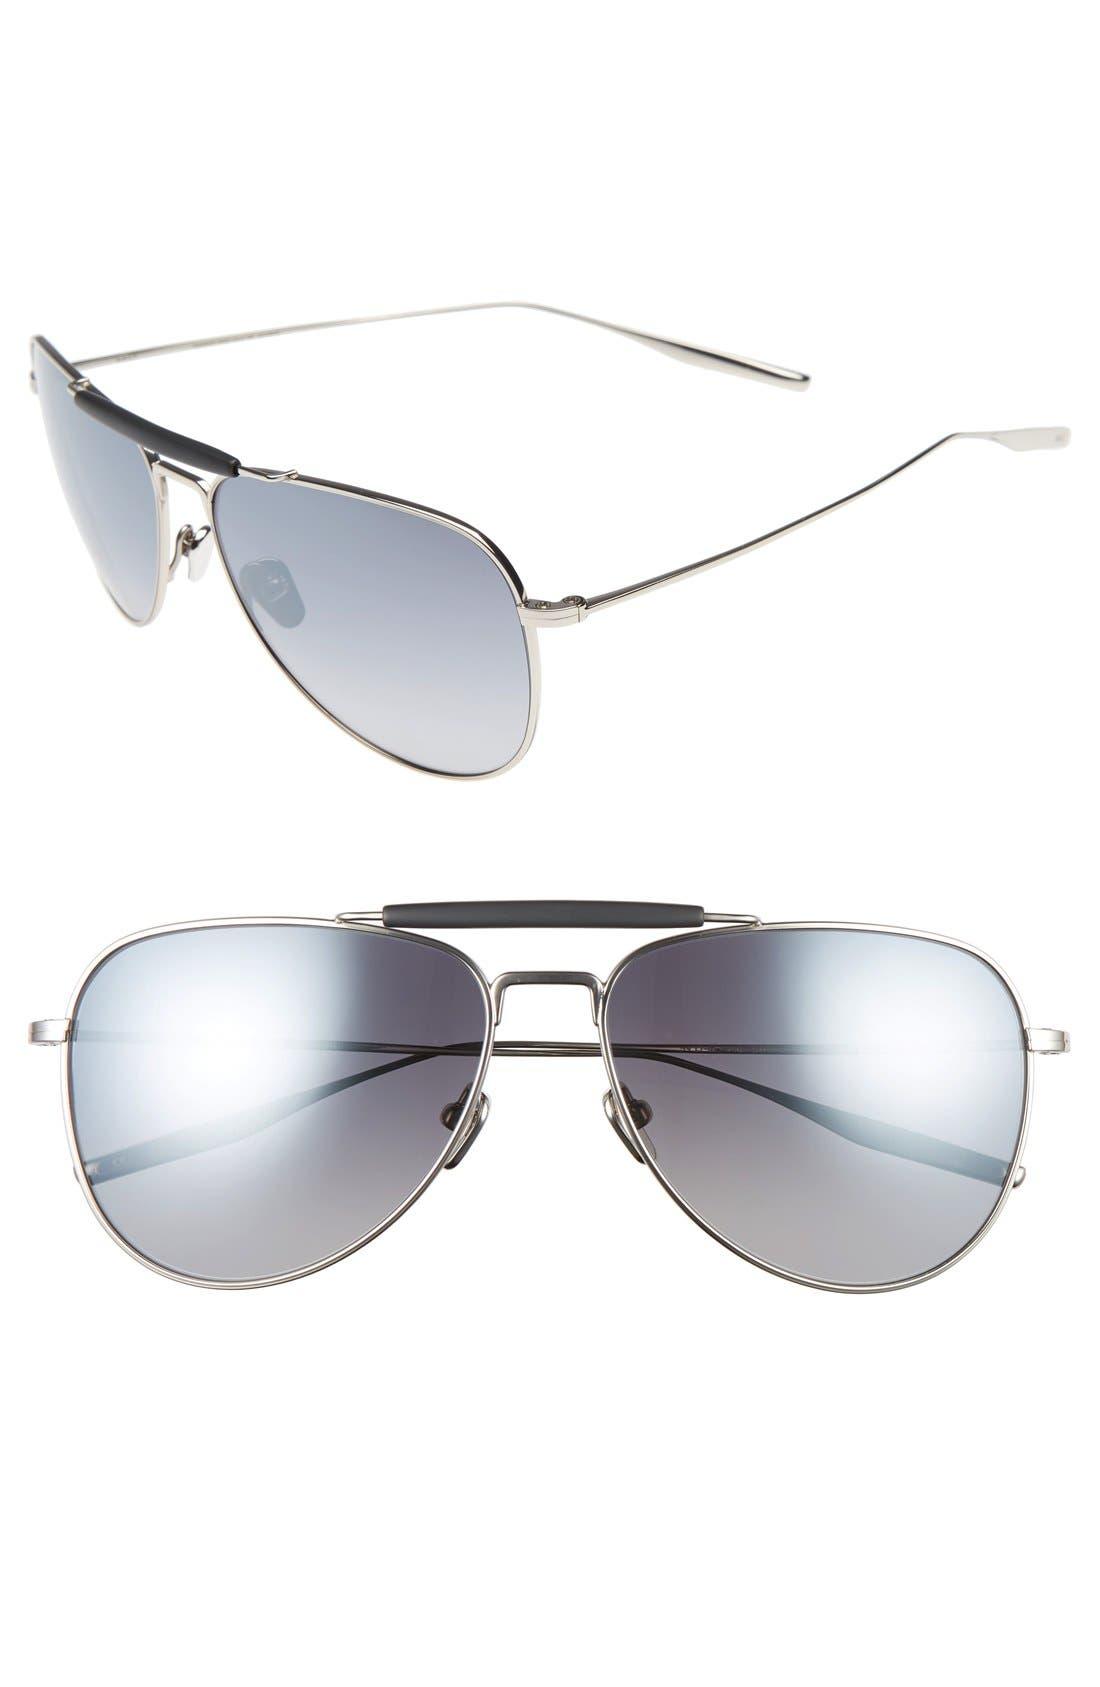 Striker 59mm Aviator Sunglasses,                         Main,                         color, TRADITIONAL SILVER